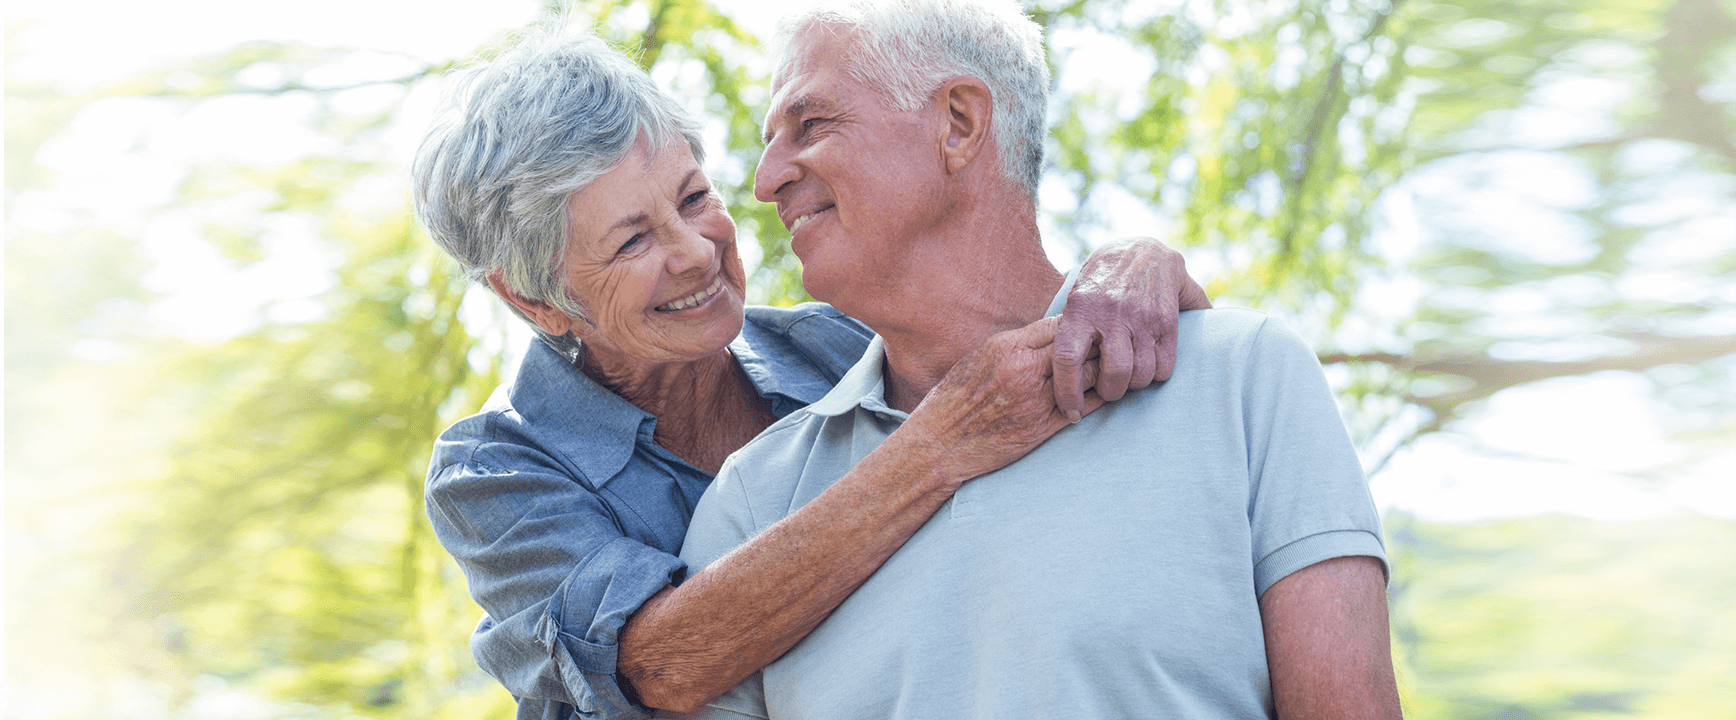 elderly couple image for oral hygiene in the elderly in Lincoln, NE